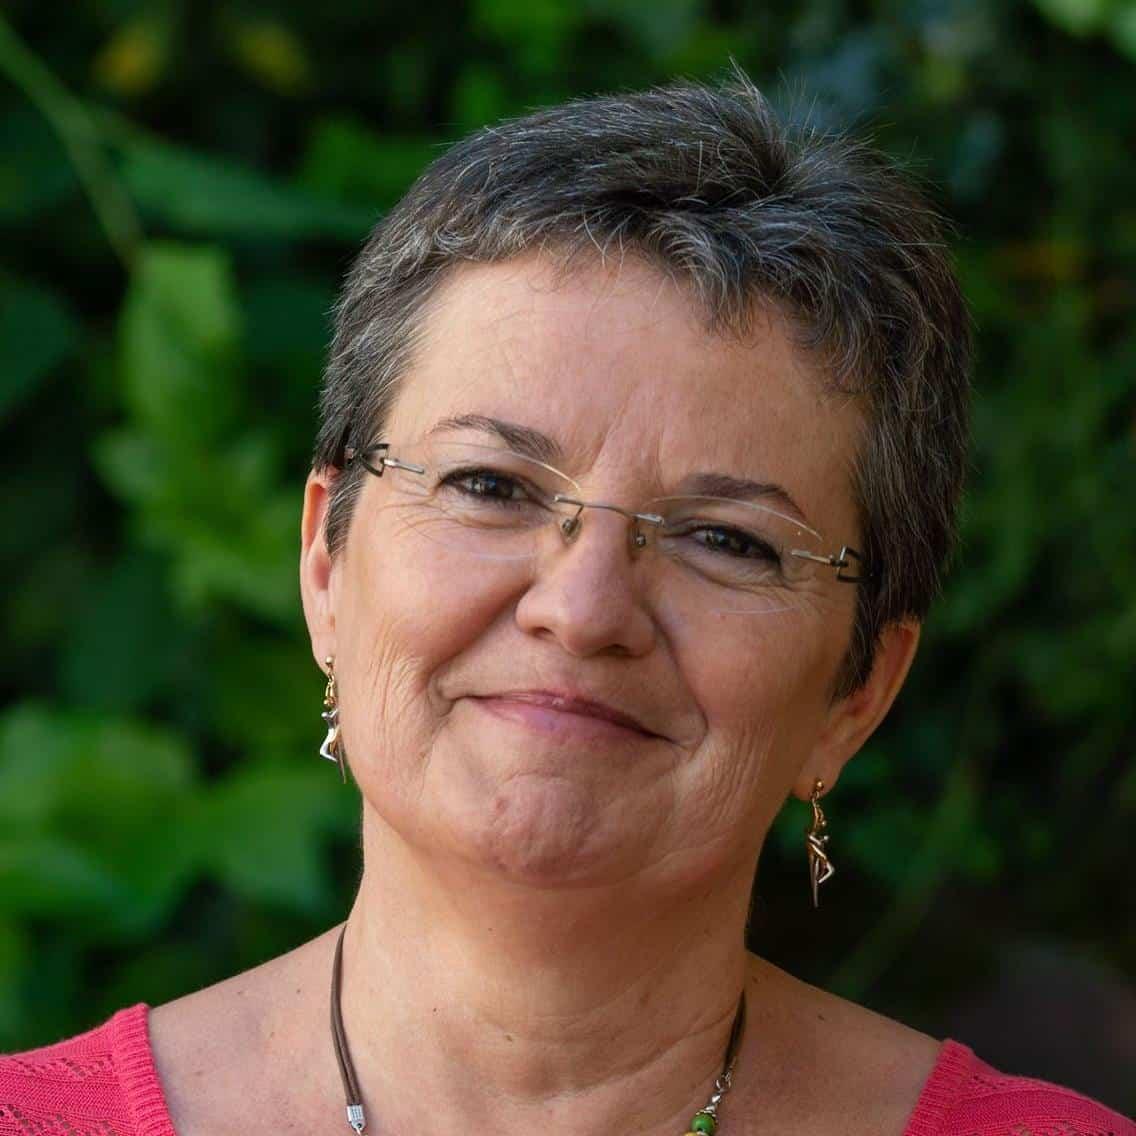 Marie-Hélène Blondel